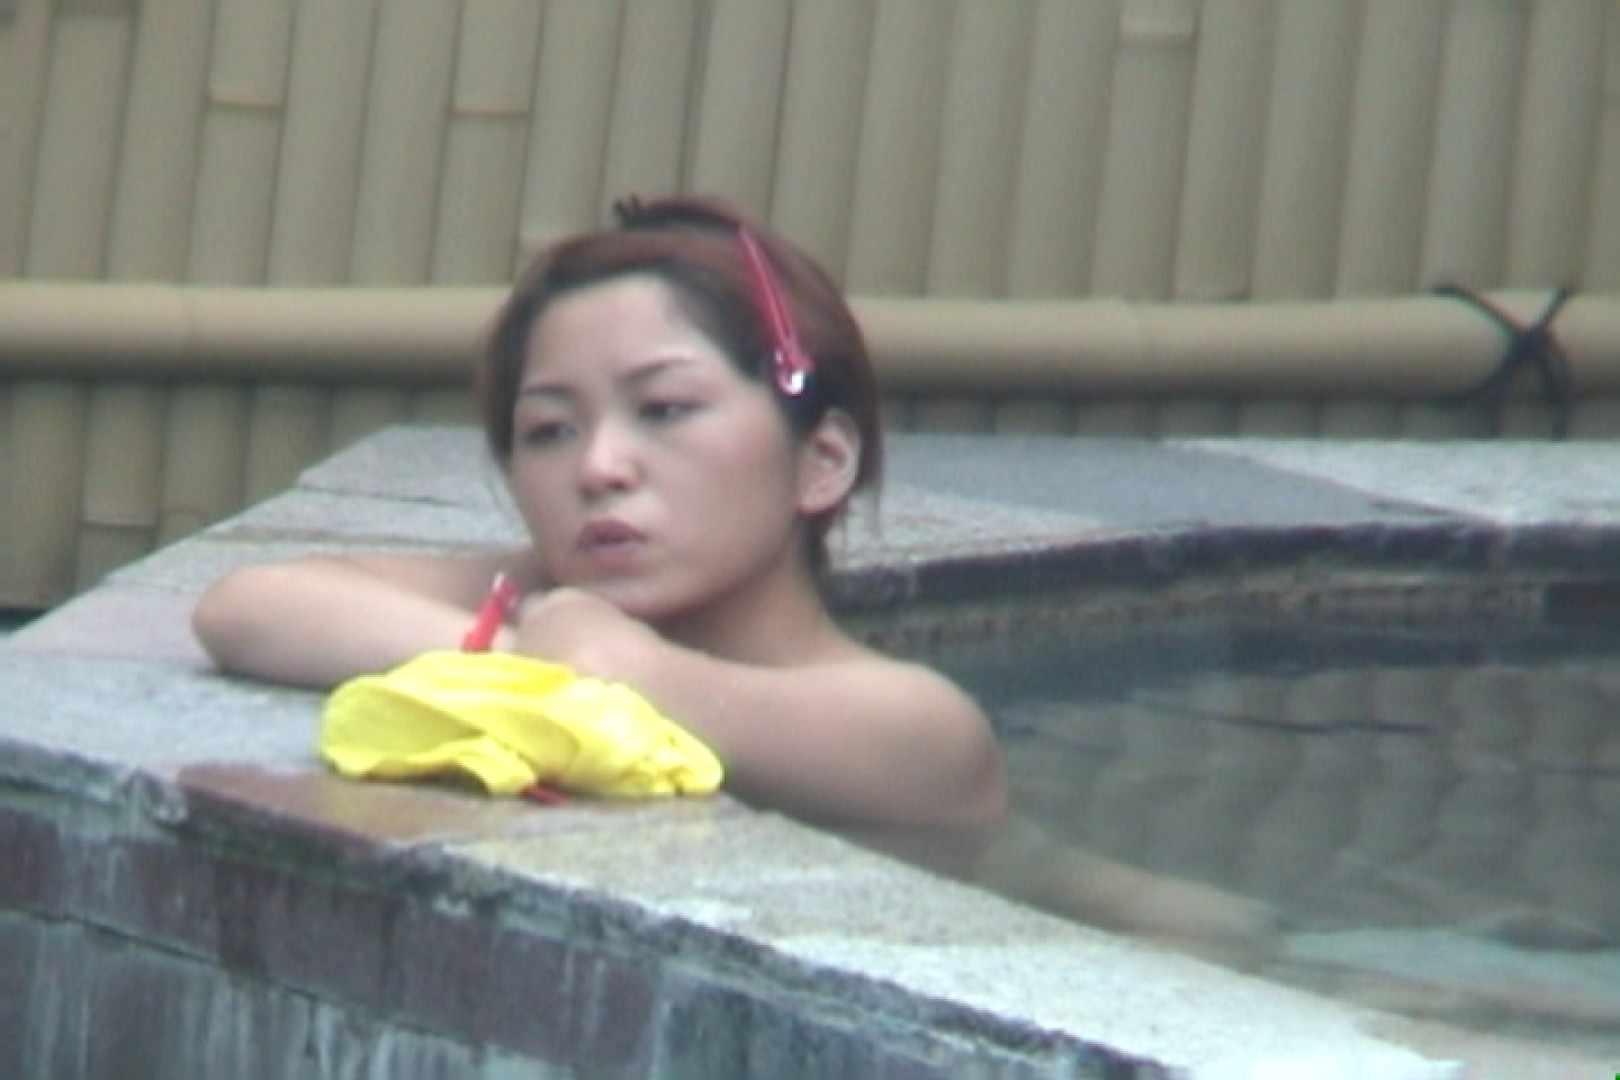 Aquaな露天風呂Vol.574 盗撮  95連発 30